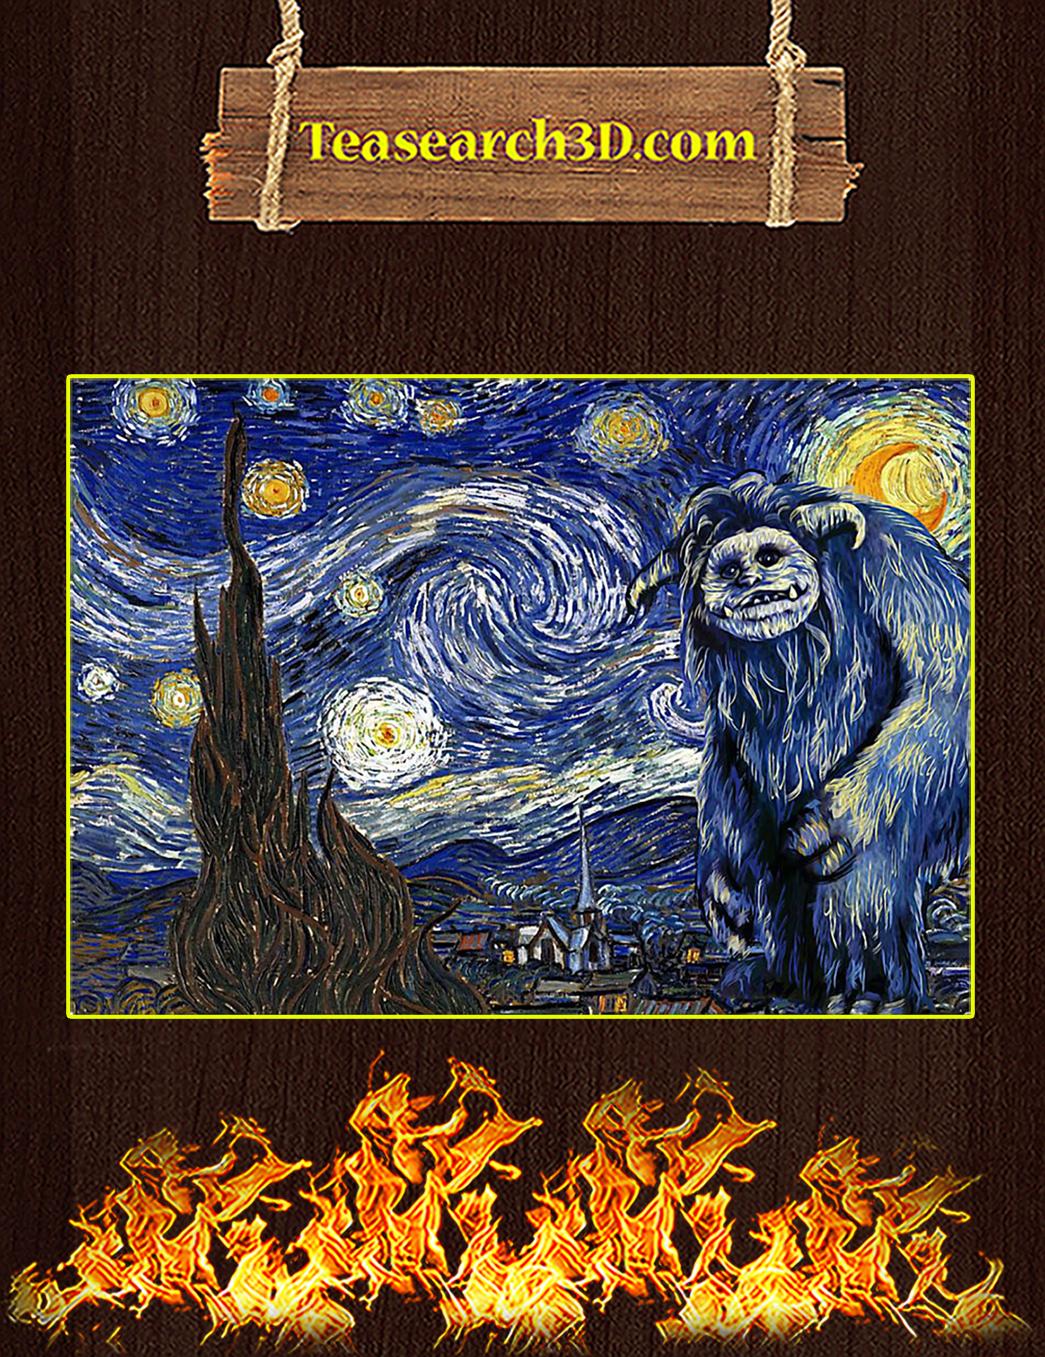 Labyrinth ludo starry night van gogh poster A1